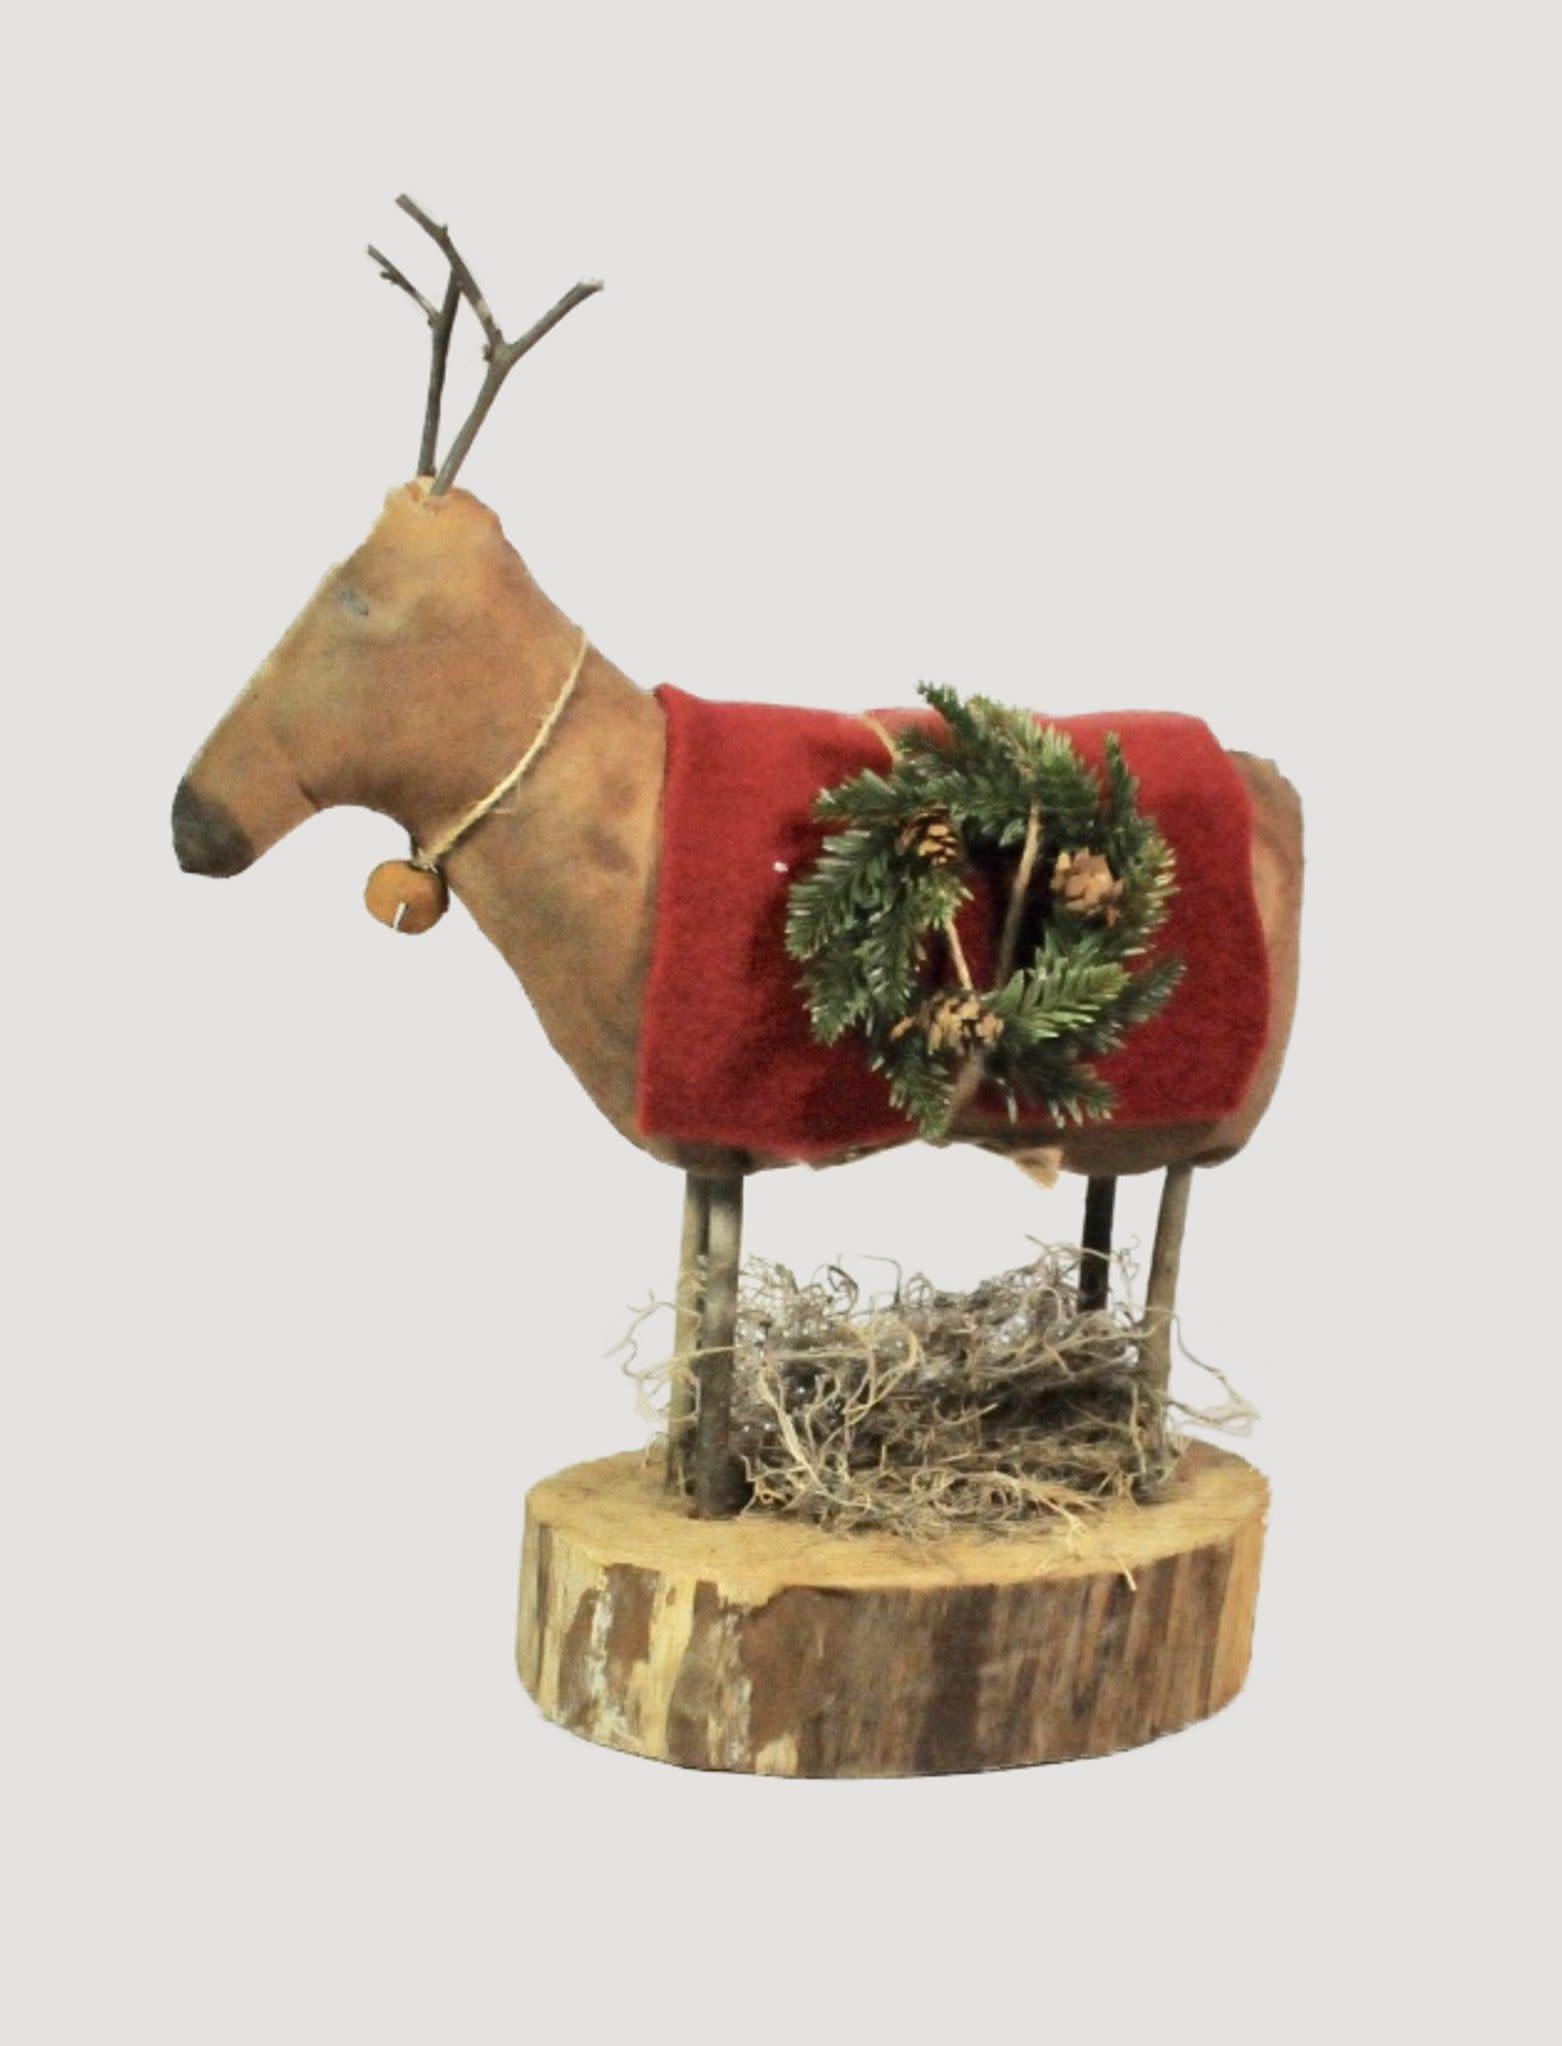 Dawns Attic Treasurers Holiday Handmade Reindeer